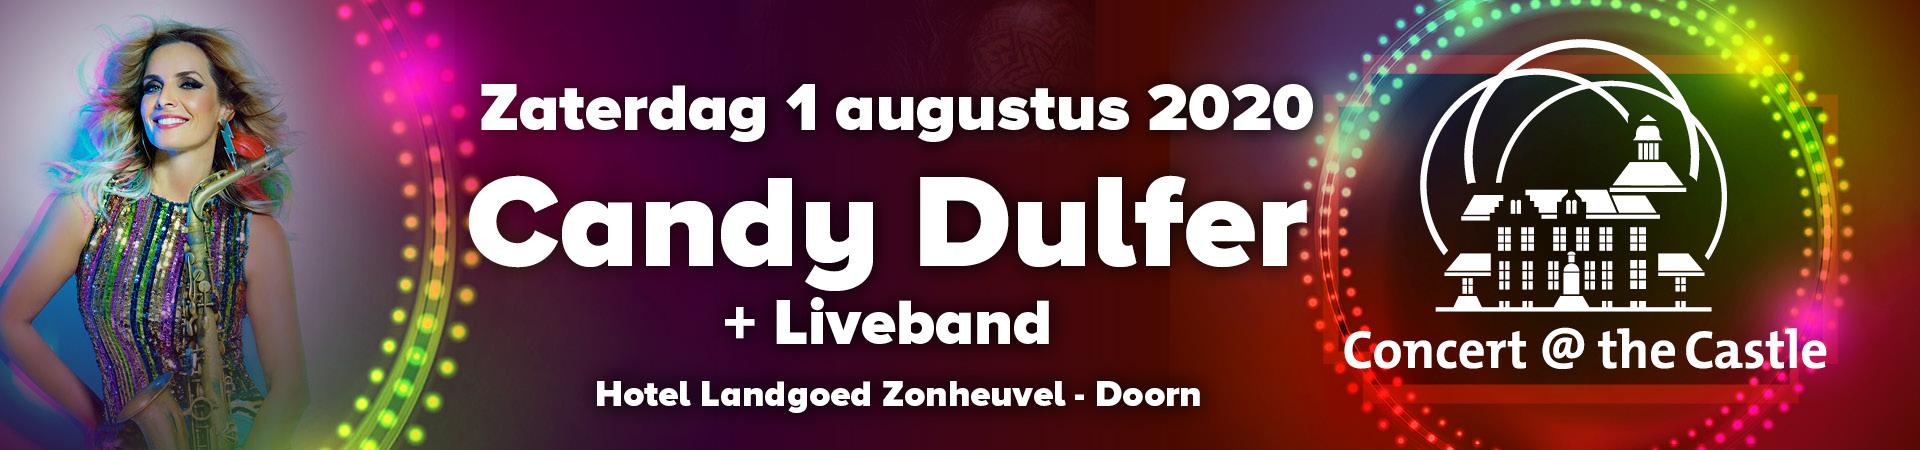 Concert @ The Castle - Candy Dulfer - 1 augustus 2020